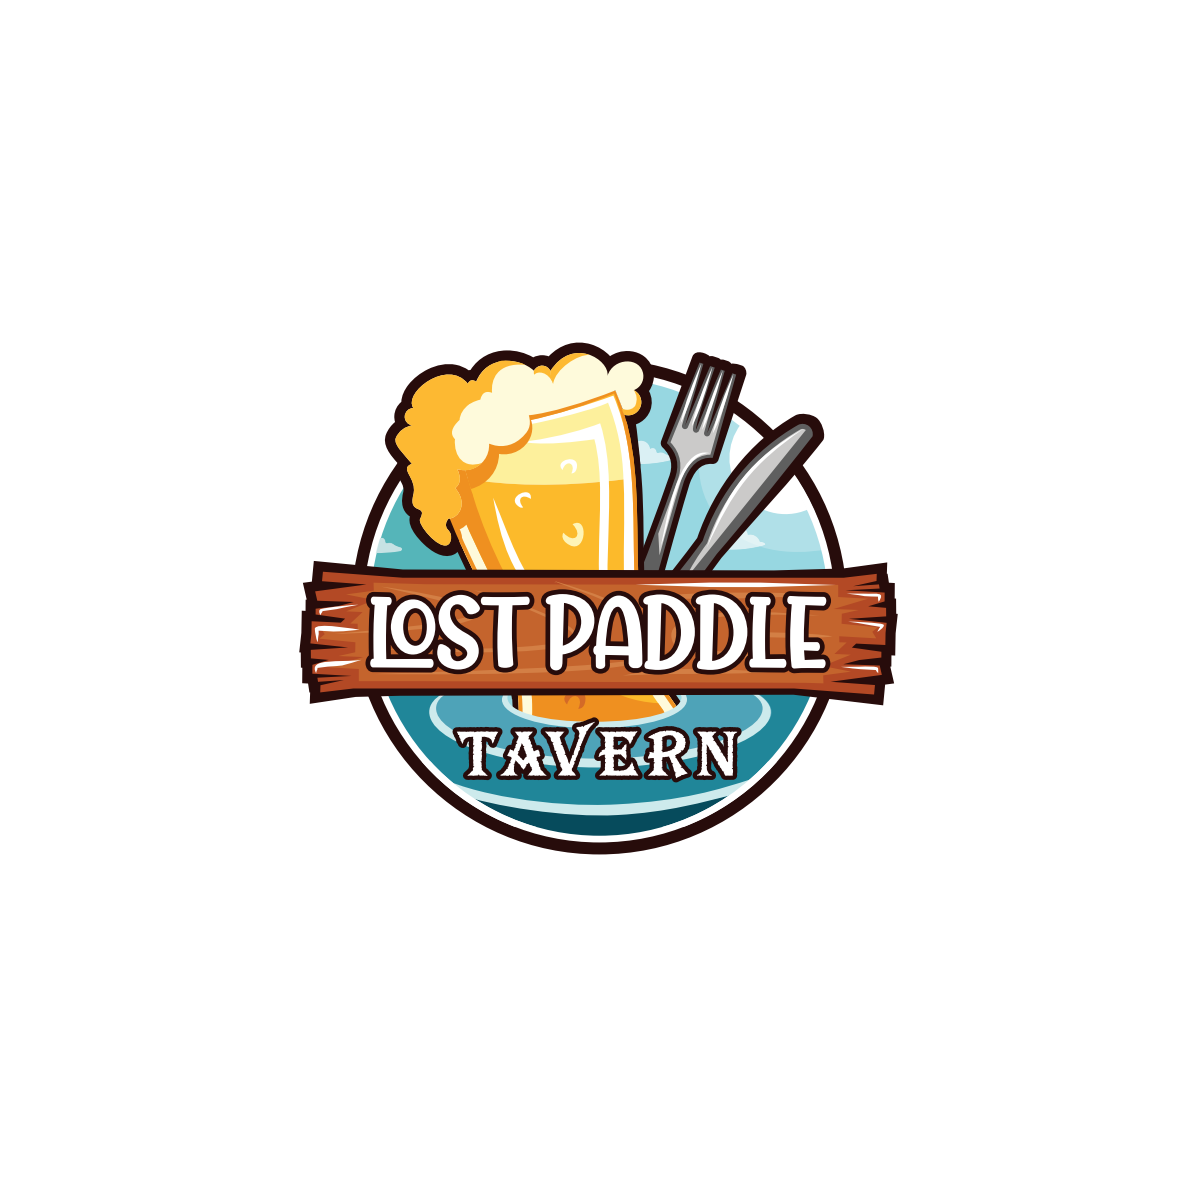 Lost Paddle Tavern logo